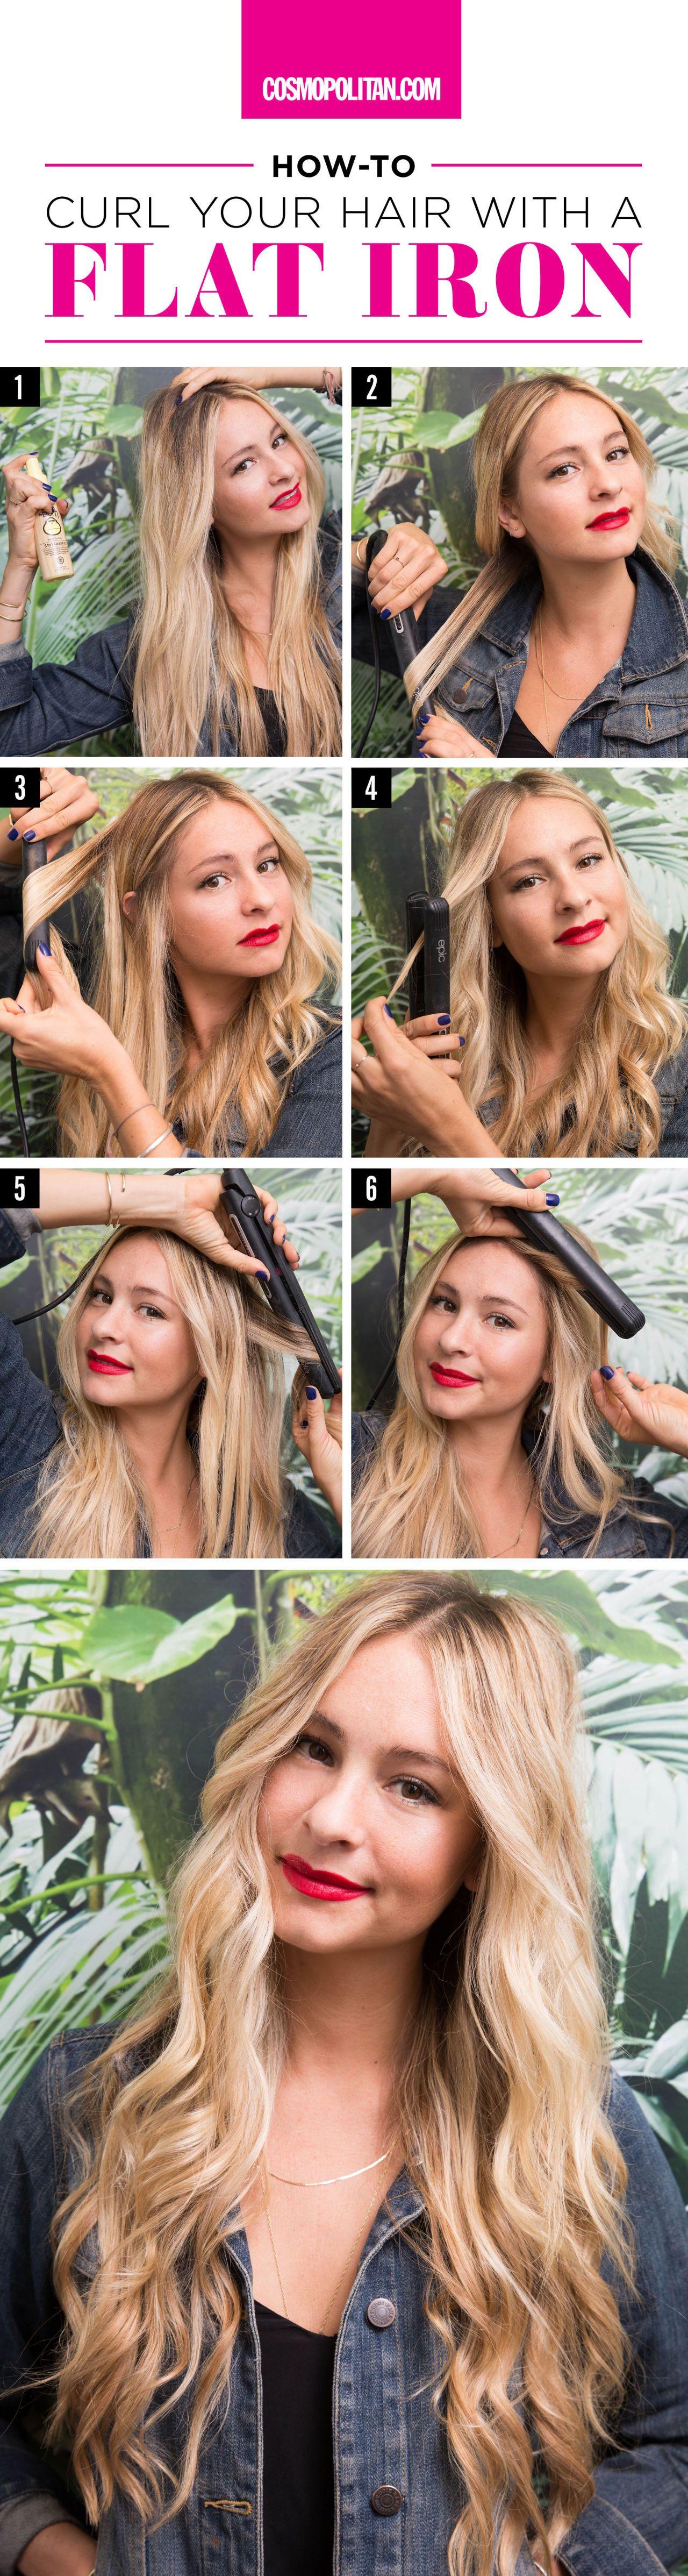 flat iron curls tutorial | flat iron curls, flat iron and iron